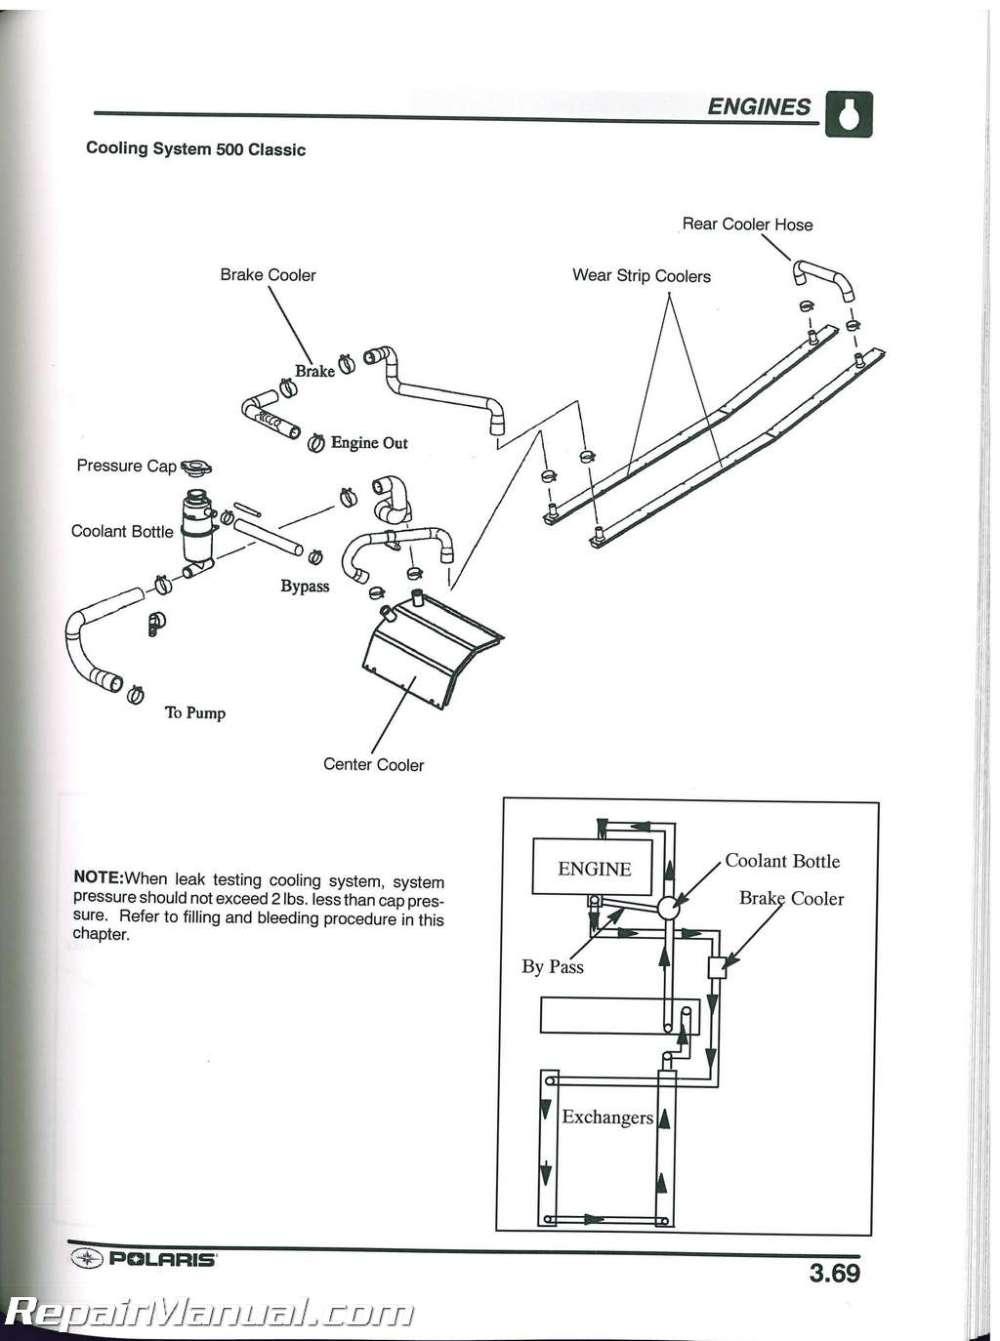 medium resolution of  diagrams 2005 2003 polaris 500 clic 550 600 700 clic edge snowmobile service